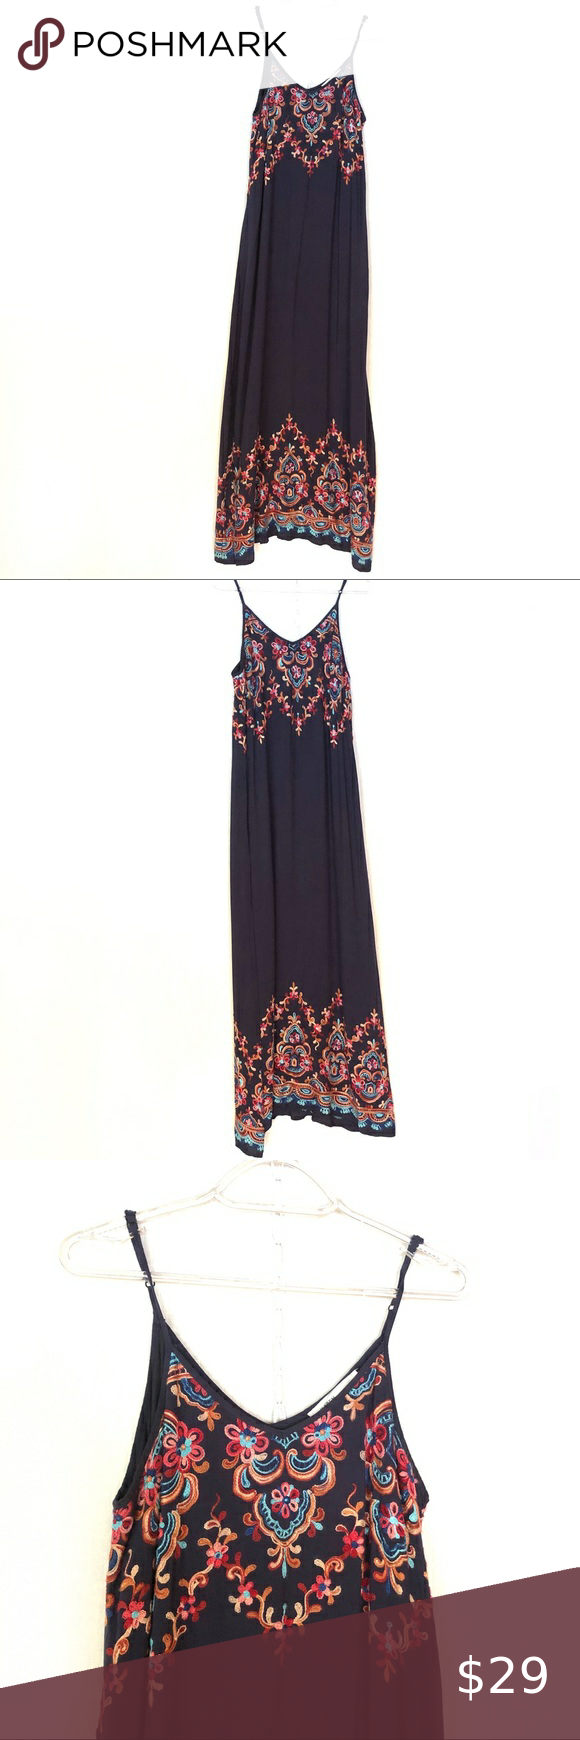 Karen Kane Maxi Dress With Embroidered Detail Maxi Dress Dresses Maxi Dress Navy [ 1740 x 580 Pixel ]